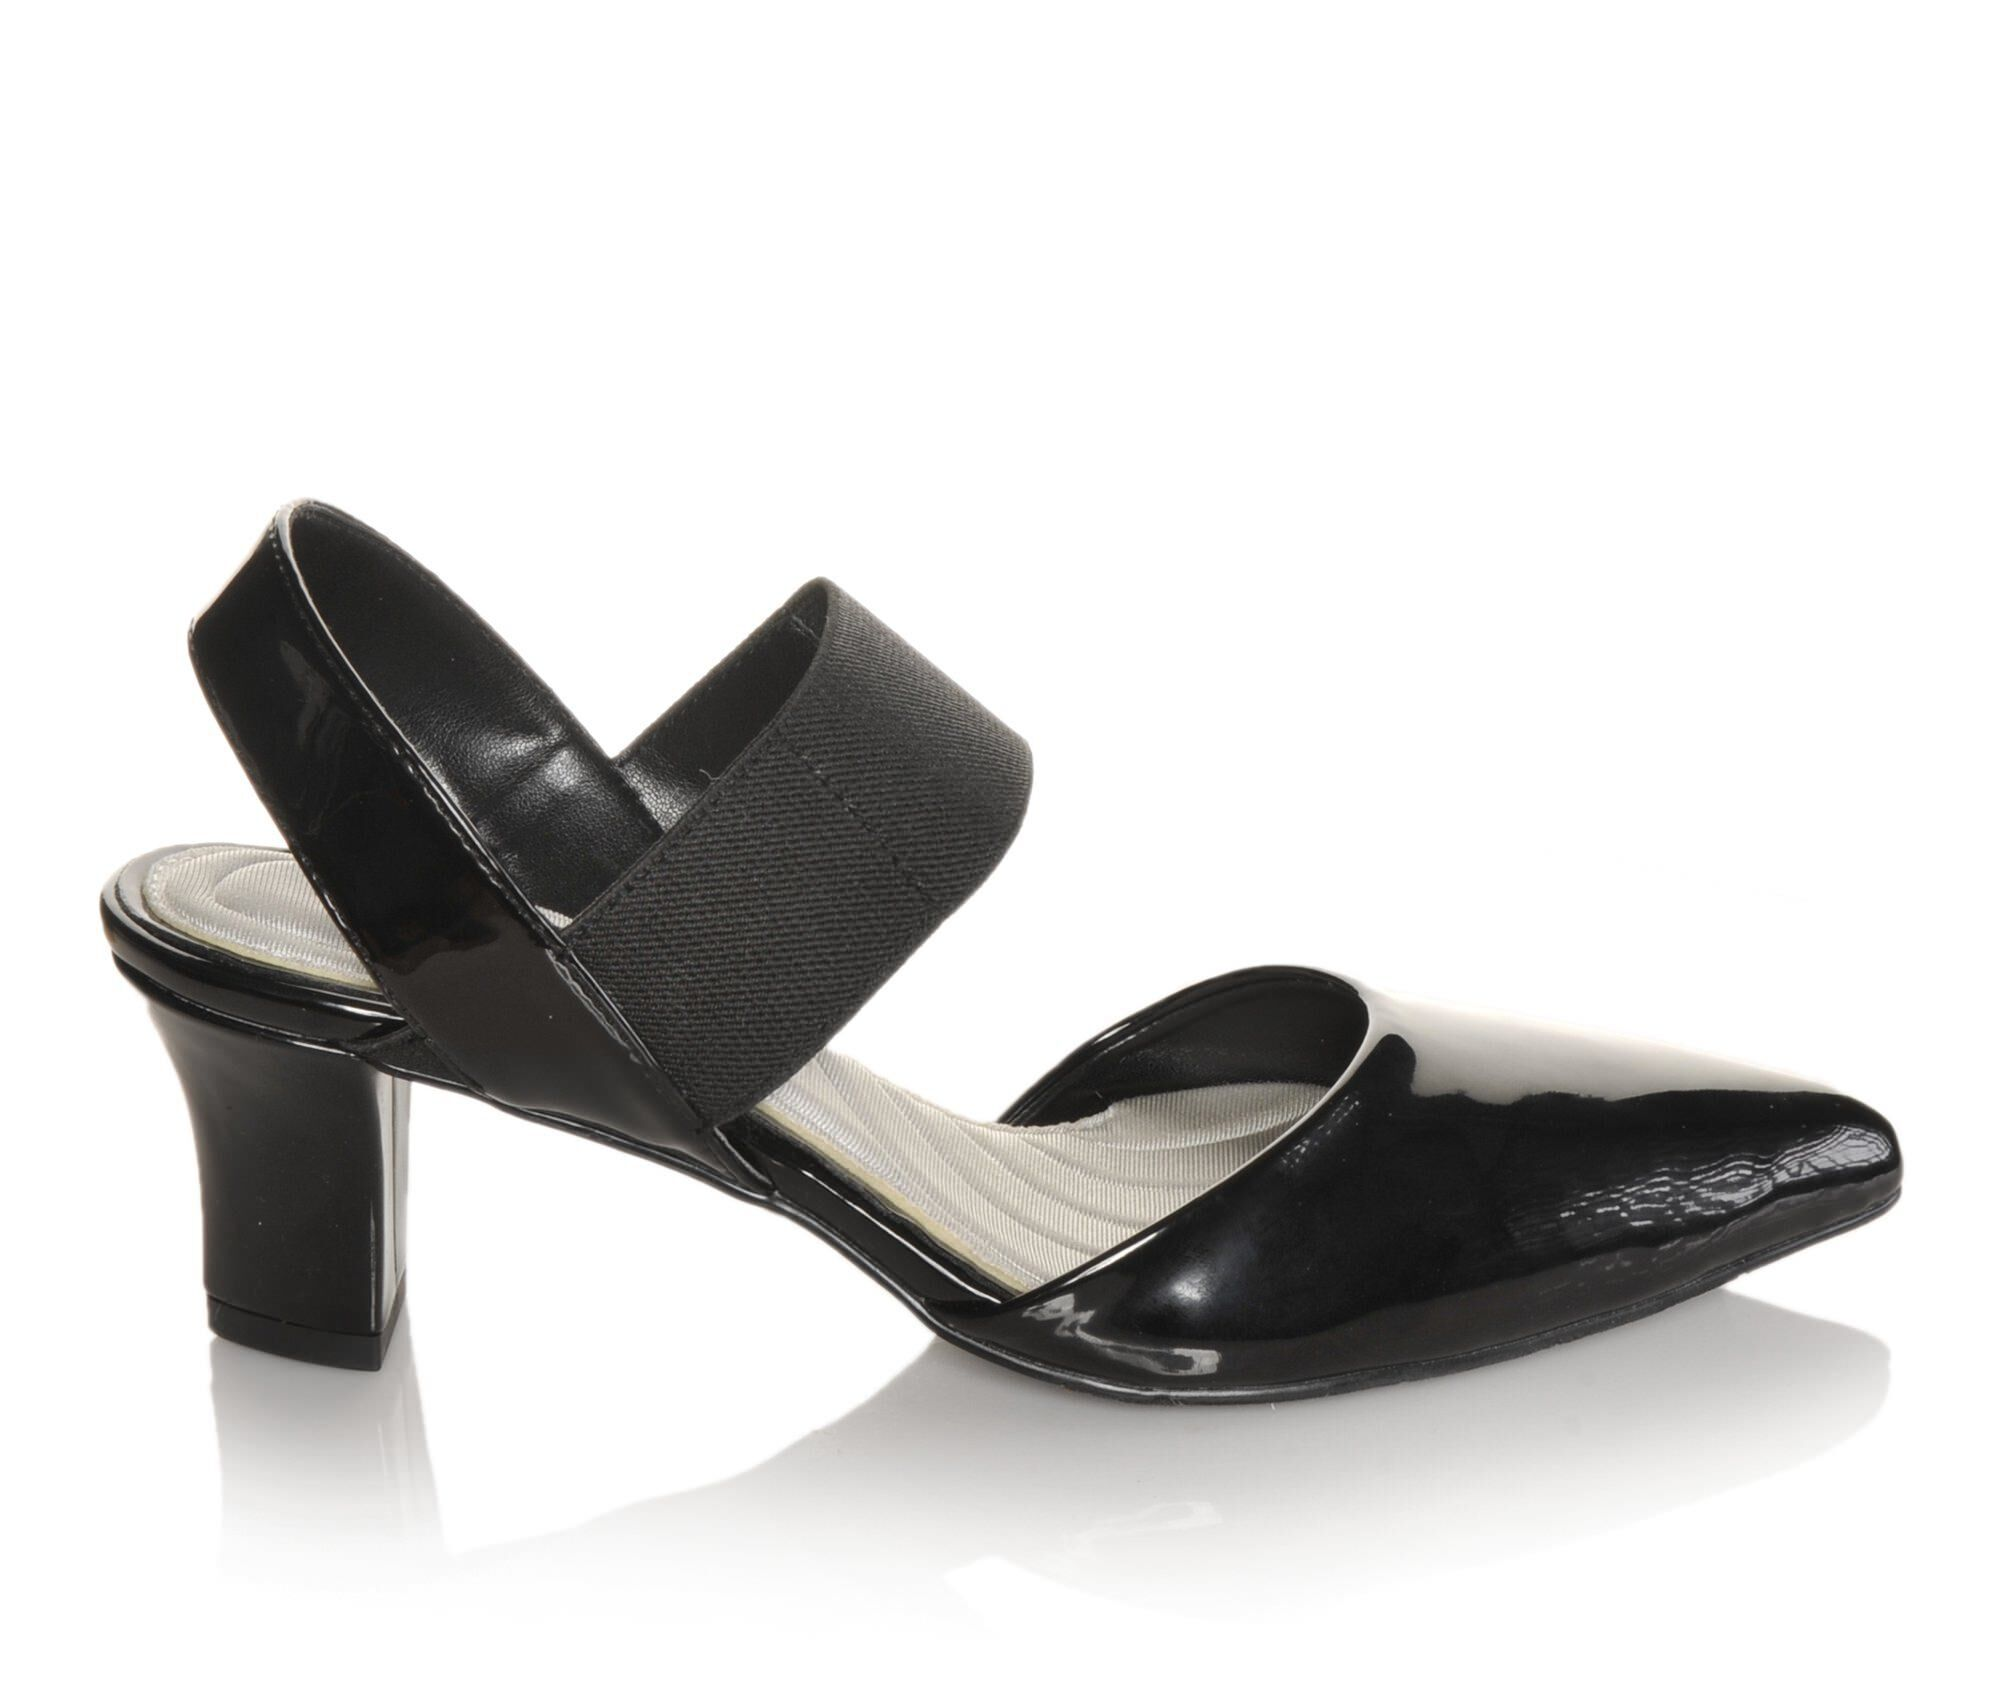 Women's Easy Street Vibrant Shoes Black Patent